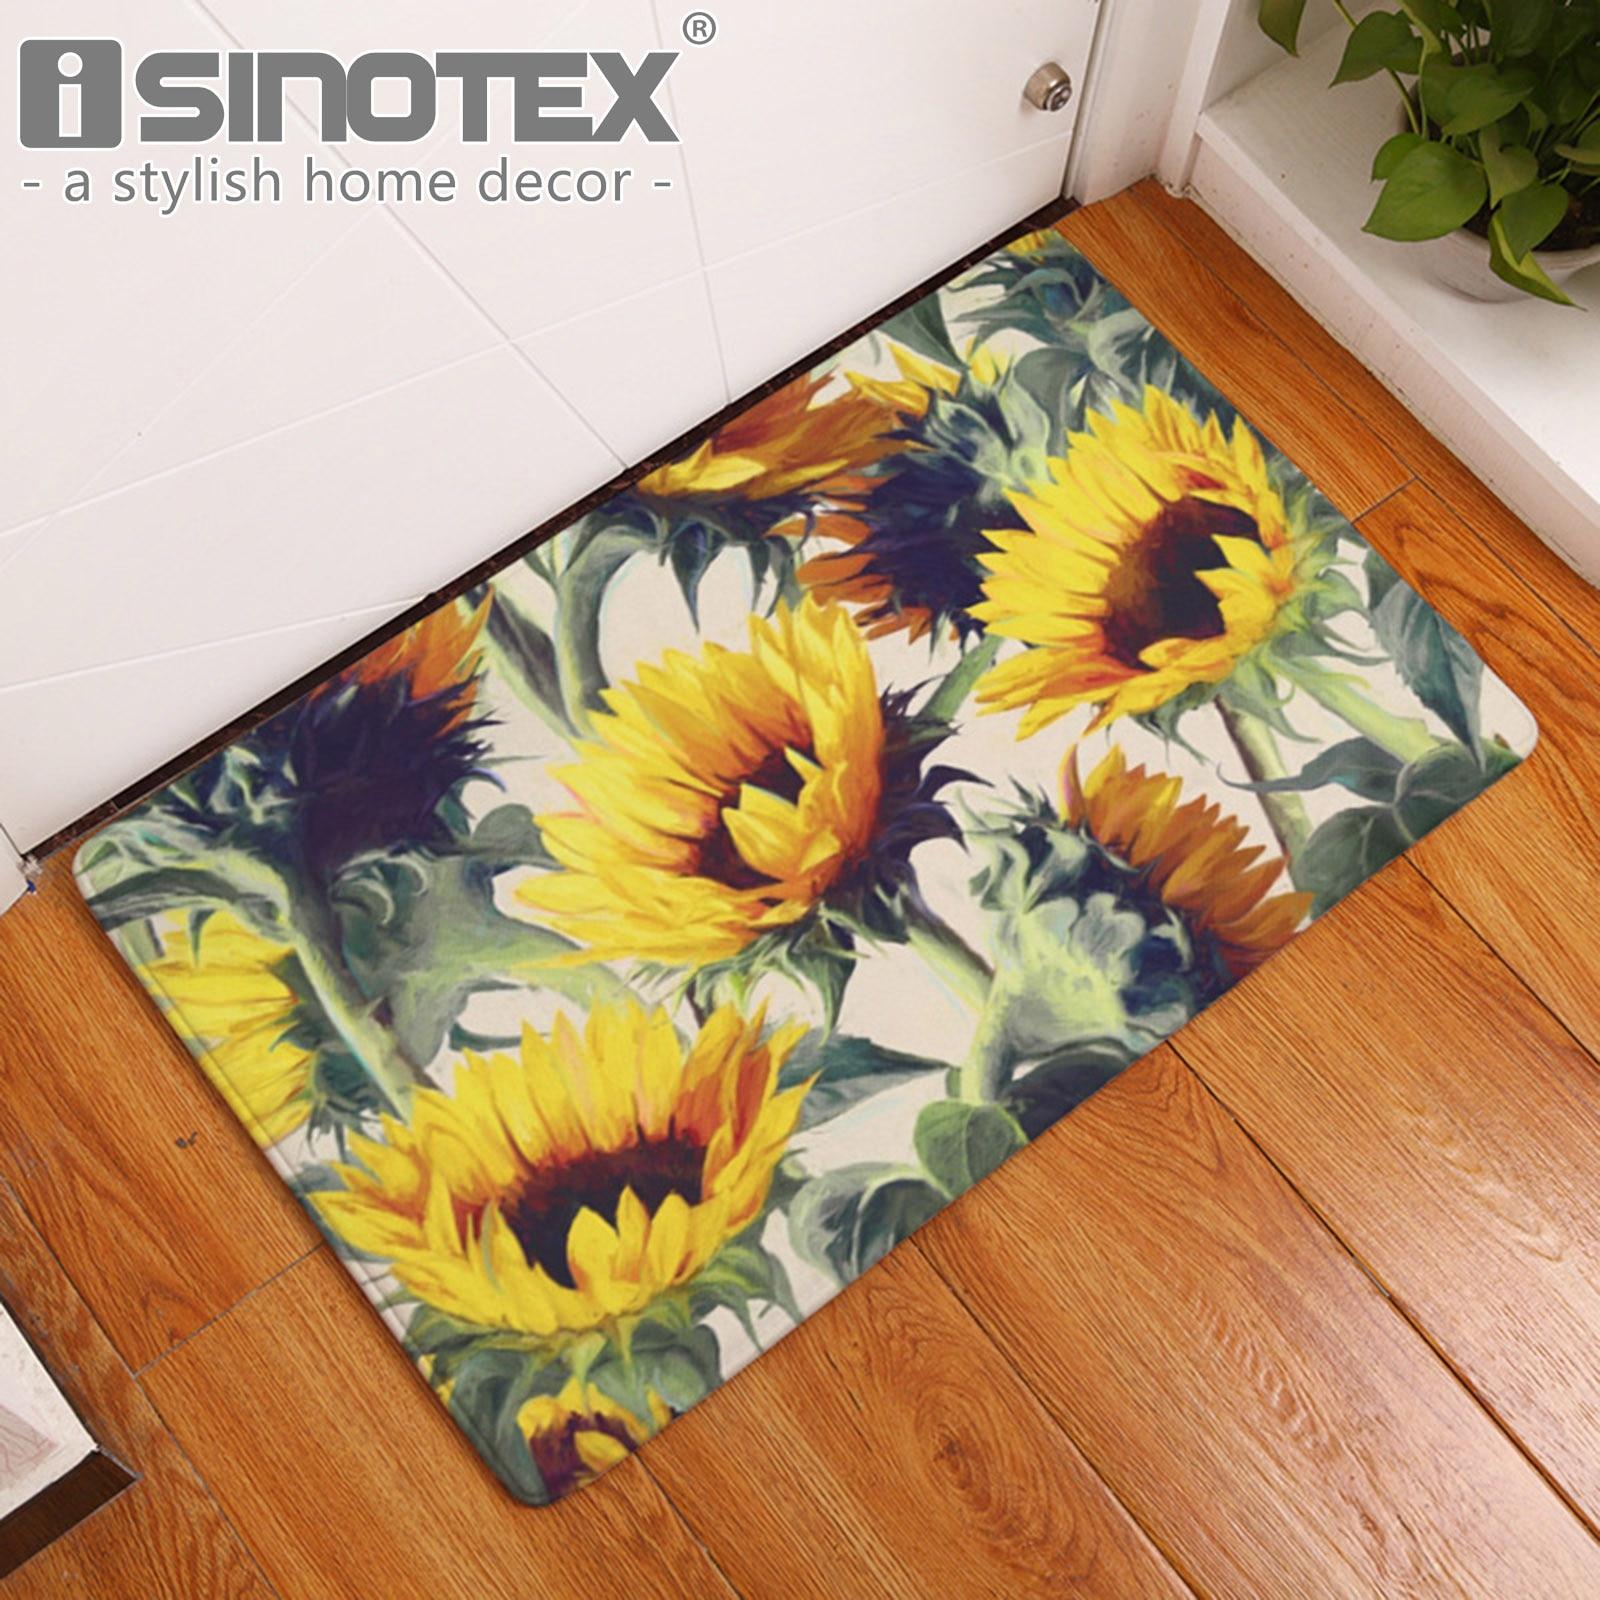 Sunflower Decorative Floor Mat Kitchen Rugs Hallway Home Entrance Door Mats Carpets Anti-Slip Floral Doormats for Living Room